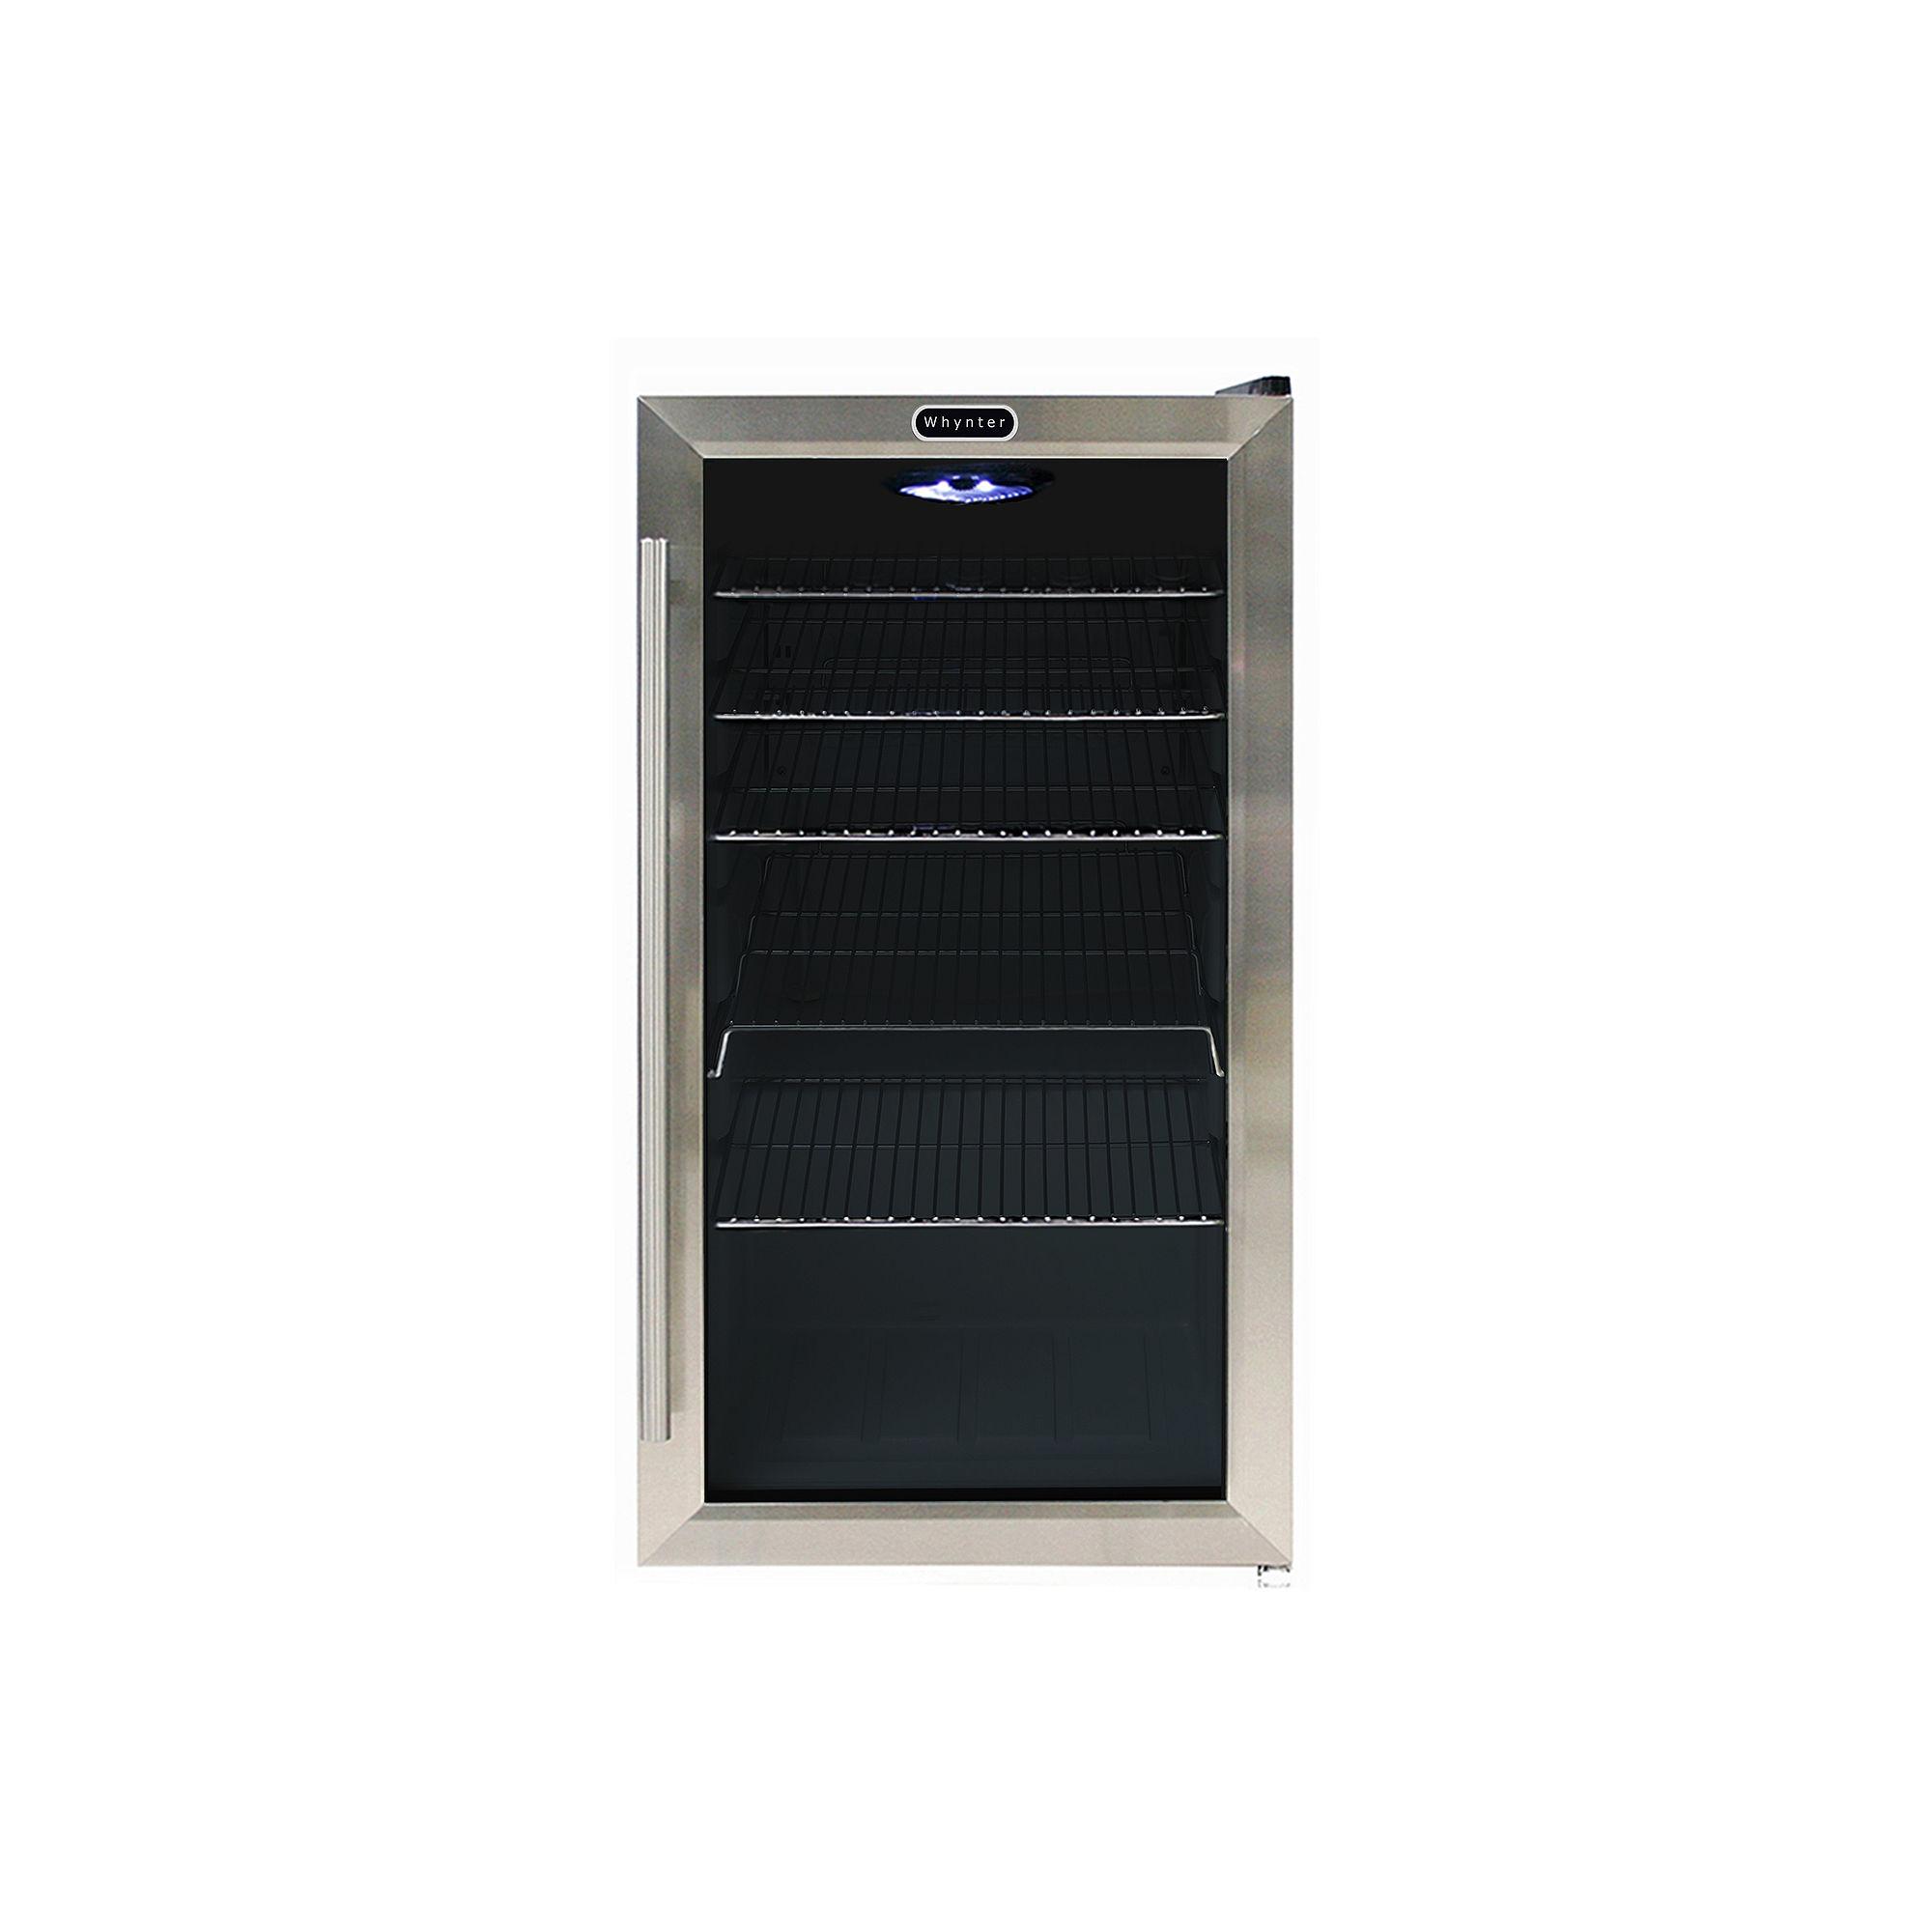 Whynter Beverage Refrigerator - Stainless Steel